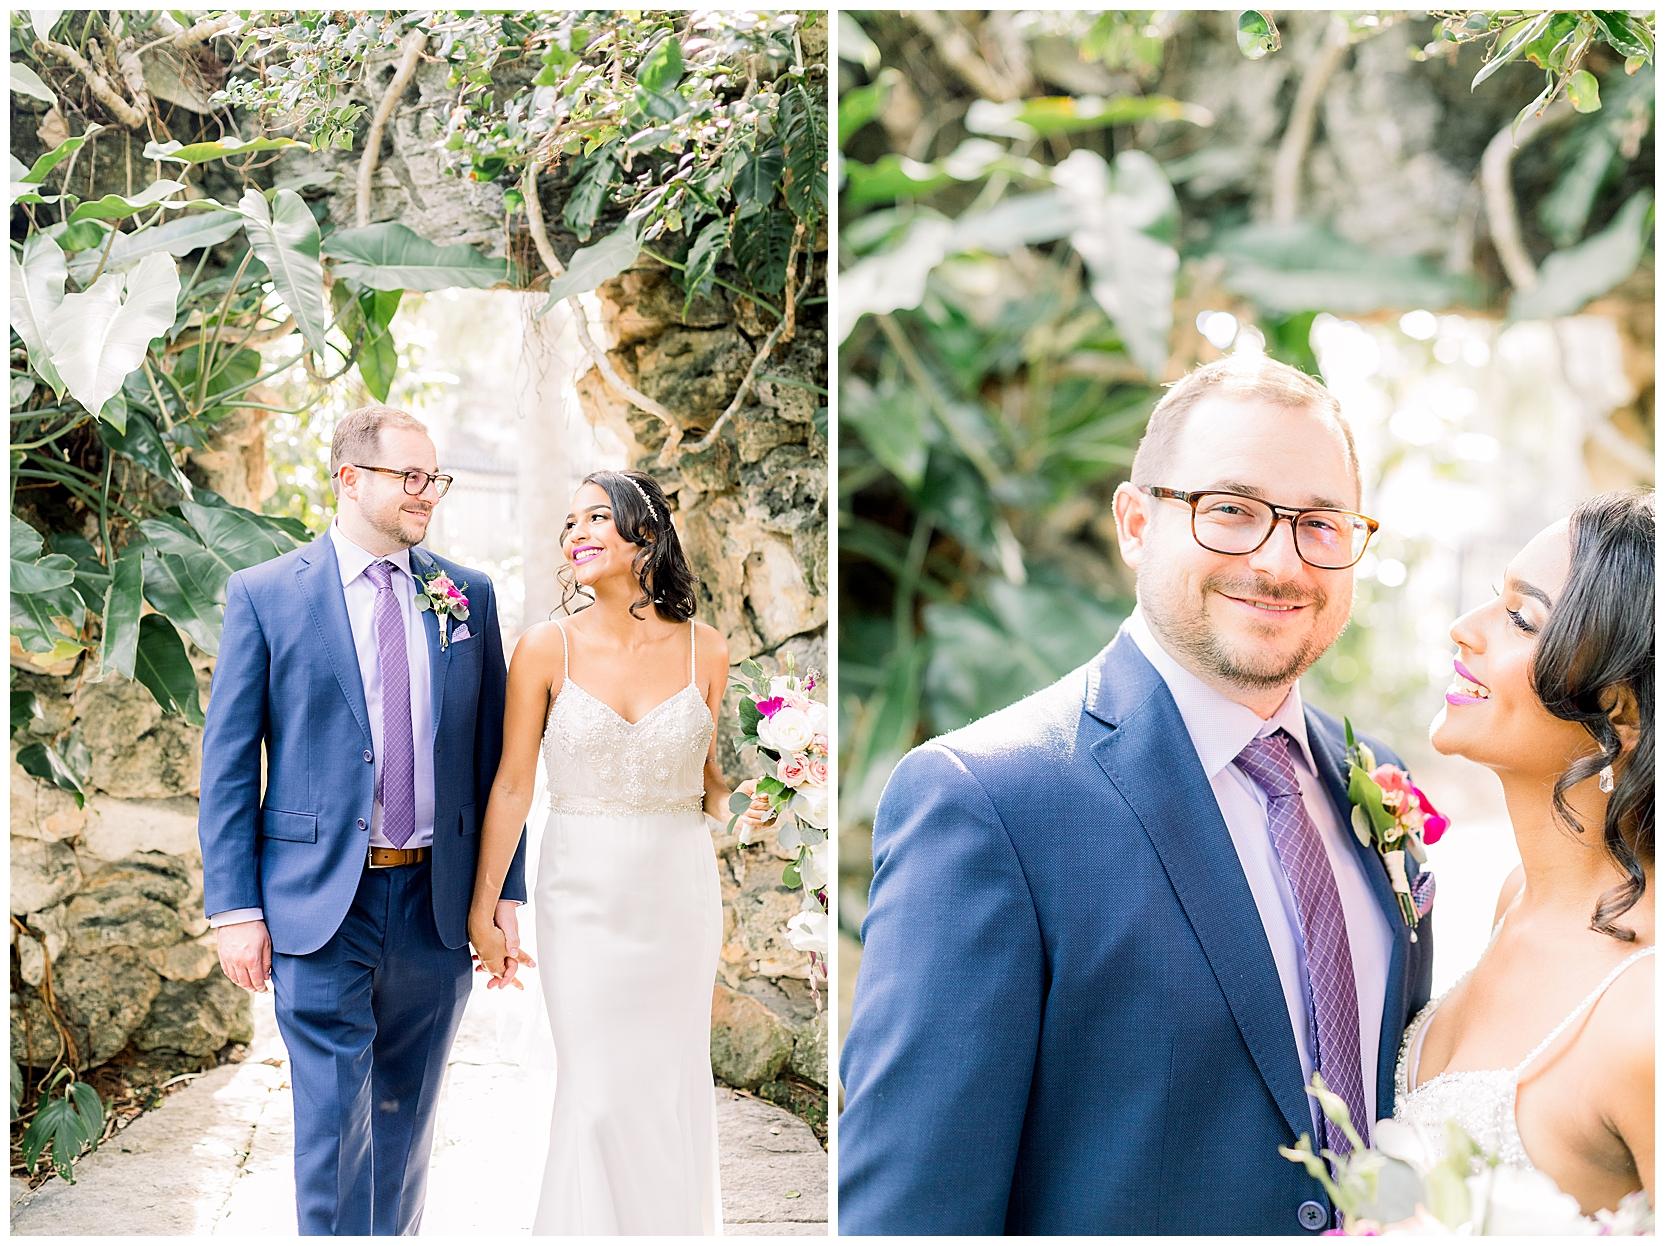 jessicafredericks_lakeland_tampa_wedding_purple_crazy hour_0031.jpg